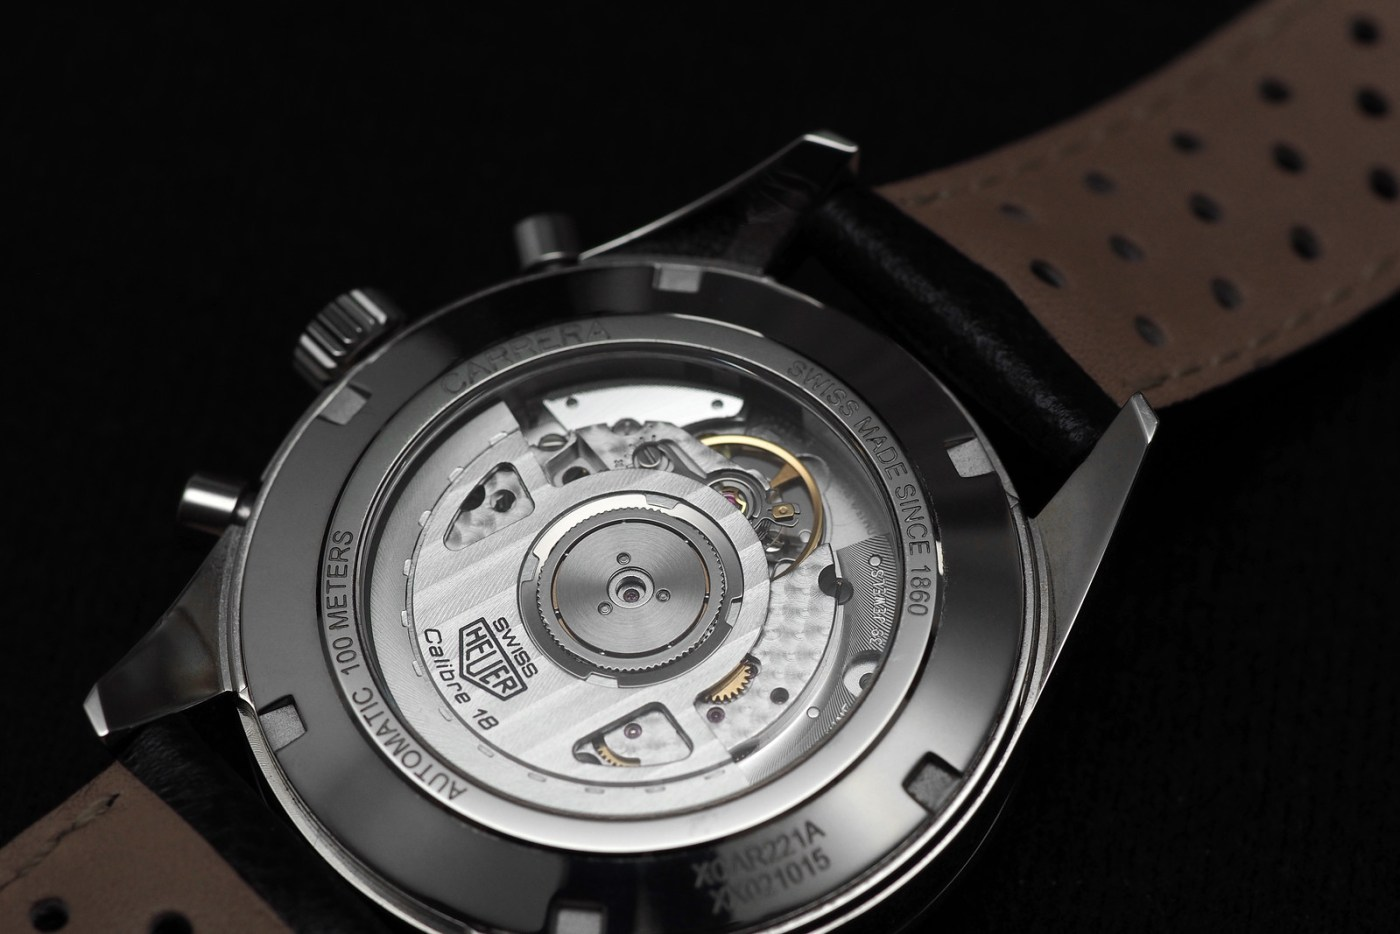 TAG Heuer Carrera Calibre 18 Automatic Chronograph caseback